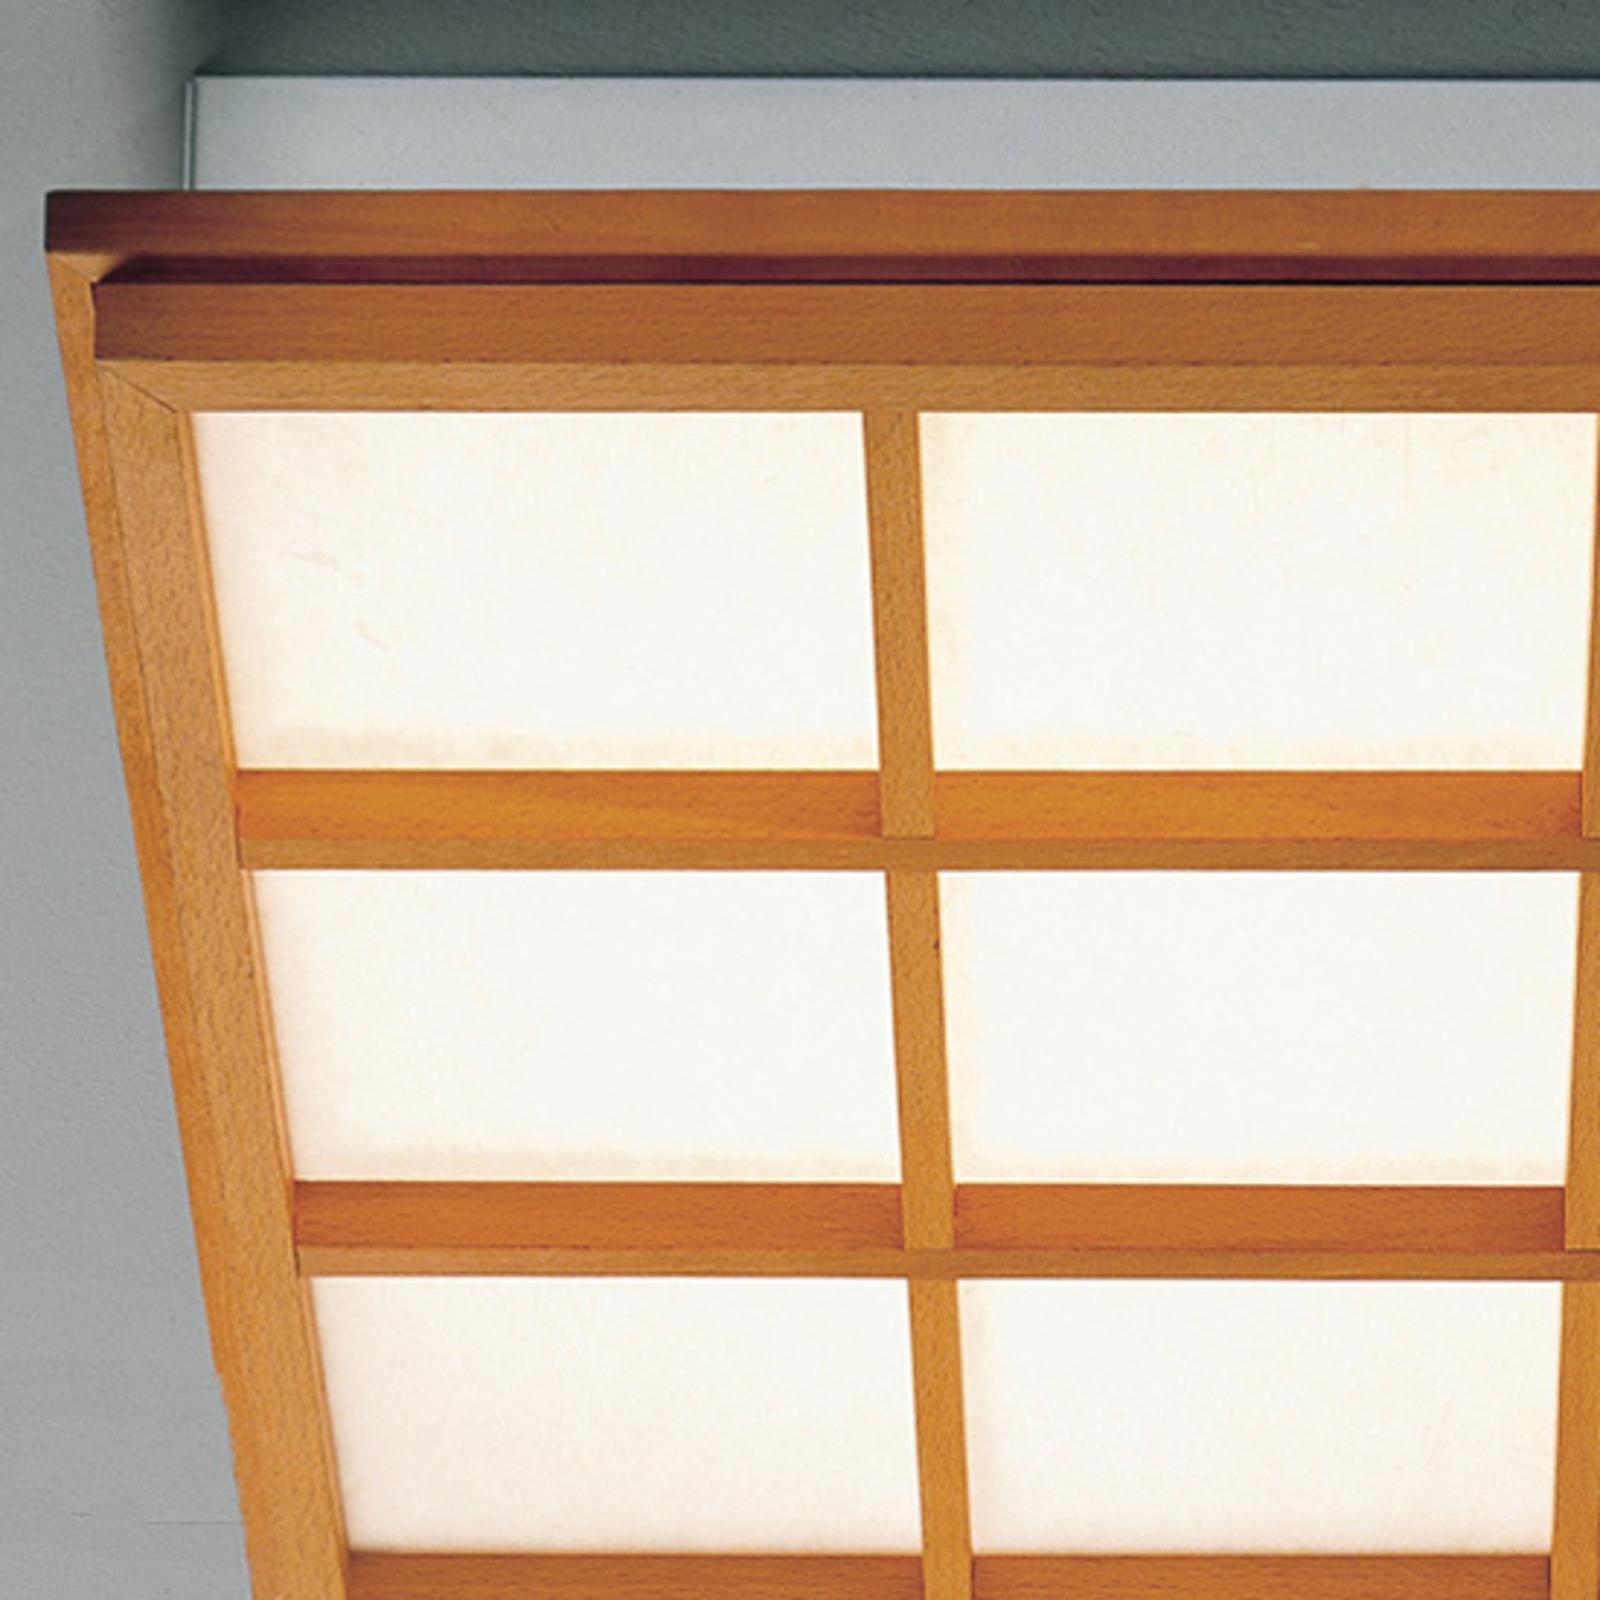 Buchenholz-Deckenleuchte Kioto 9 mit LED